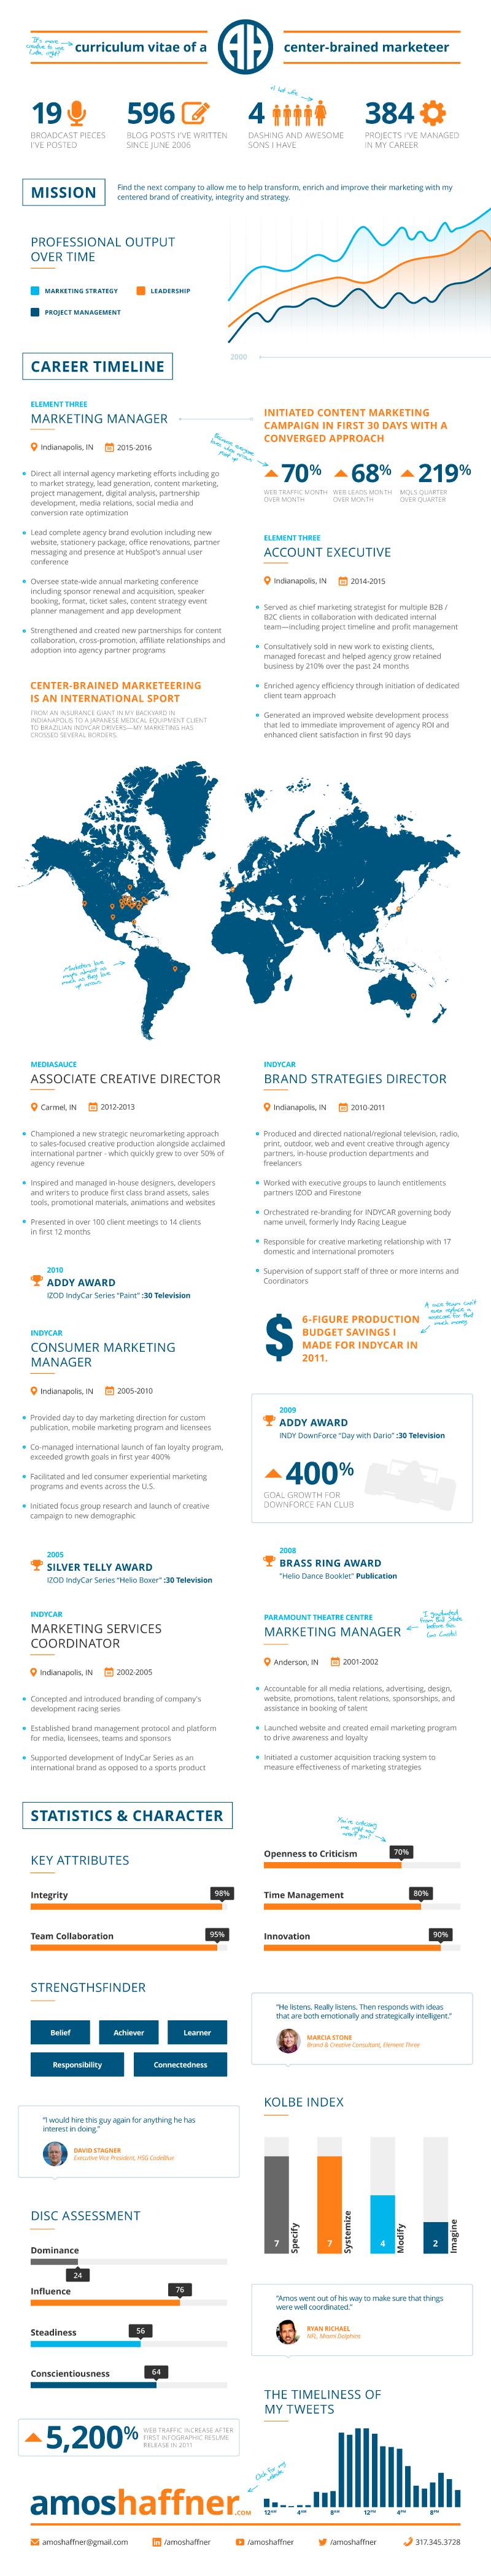 Amos_Haffner_infographic_resume_2016